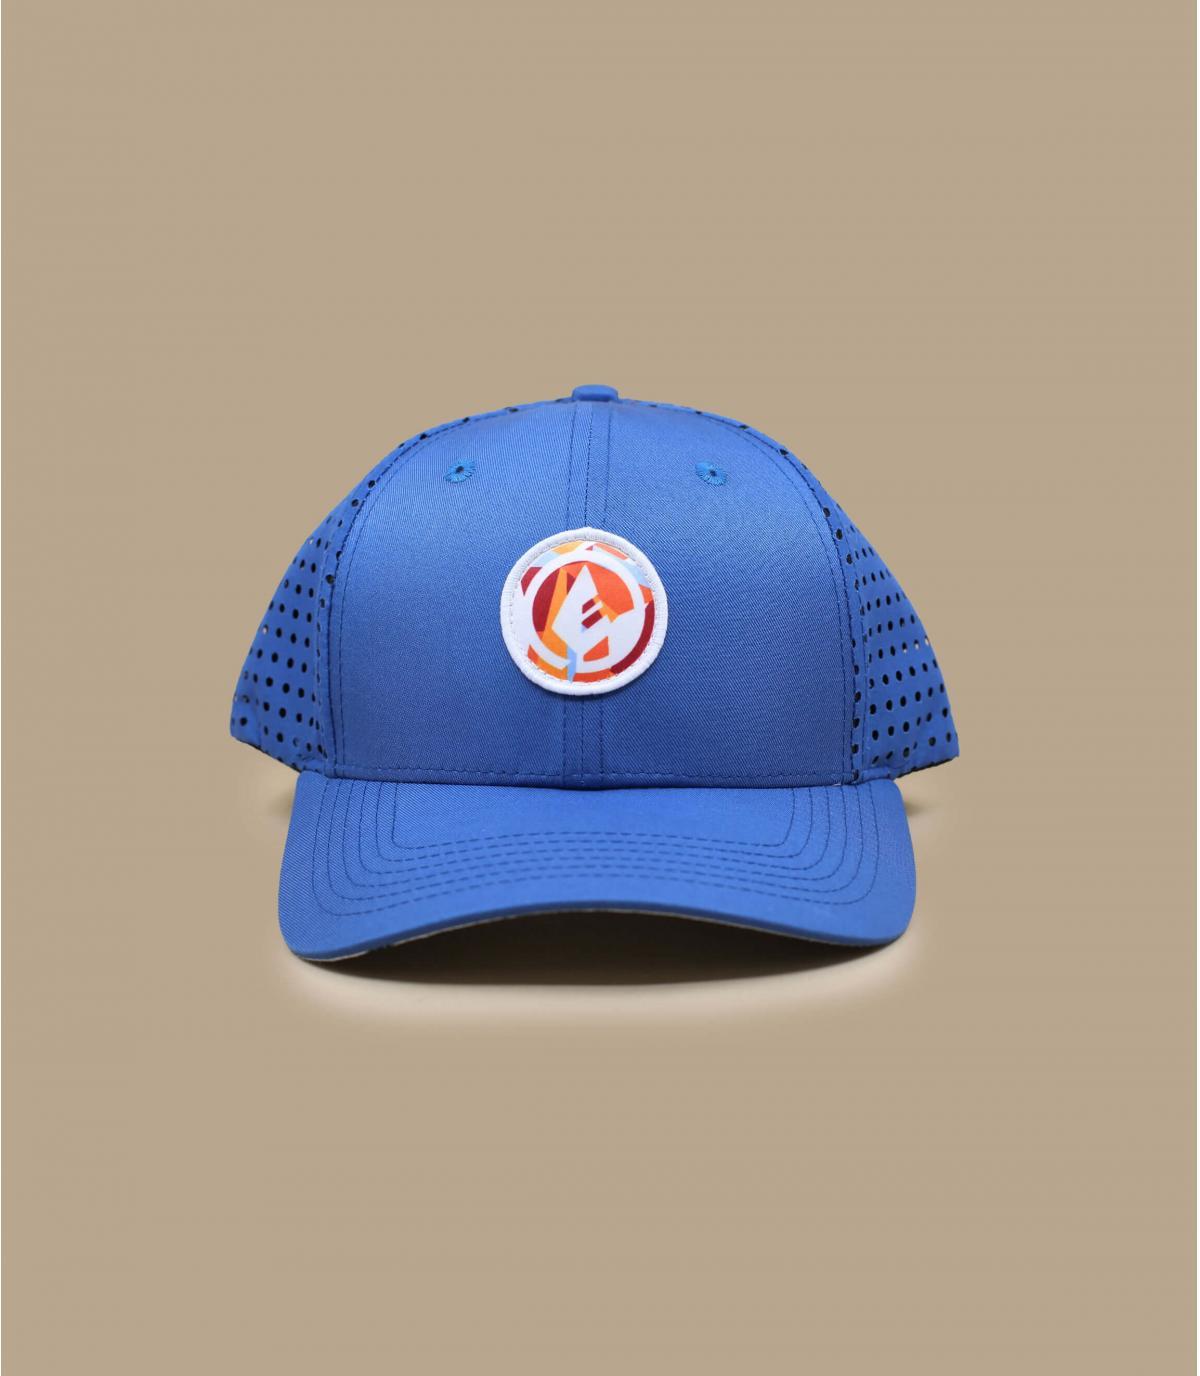 casquette NOSC bleu